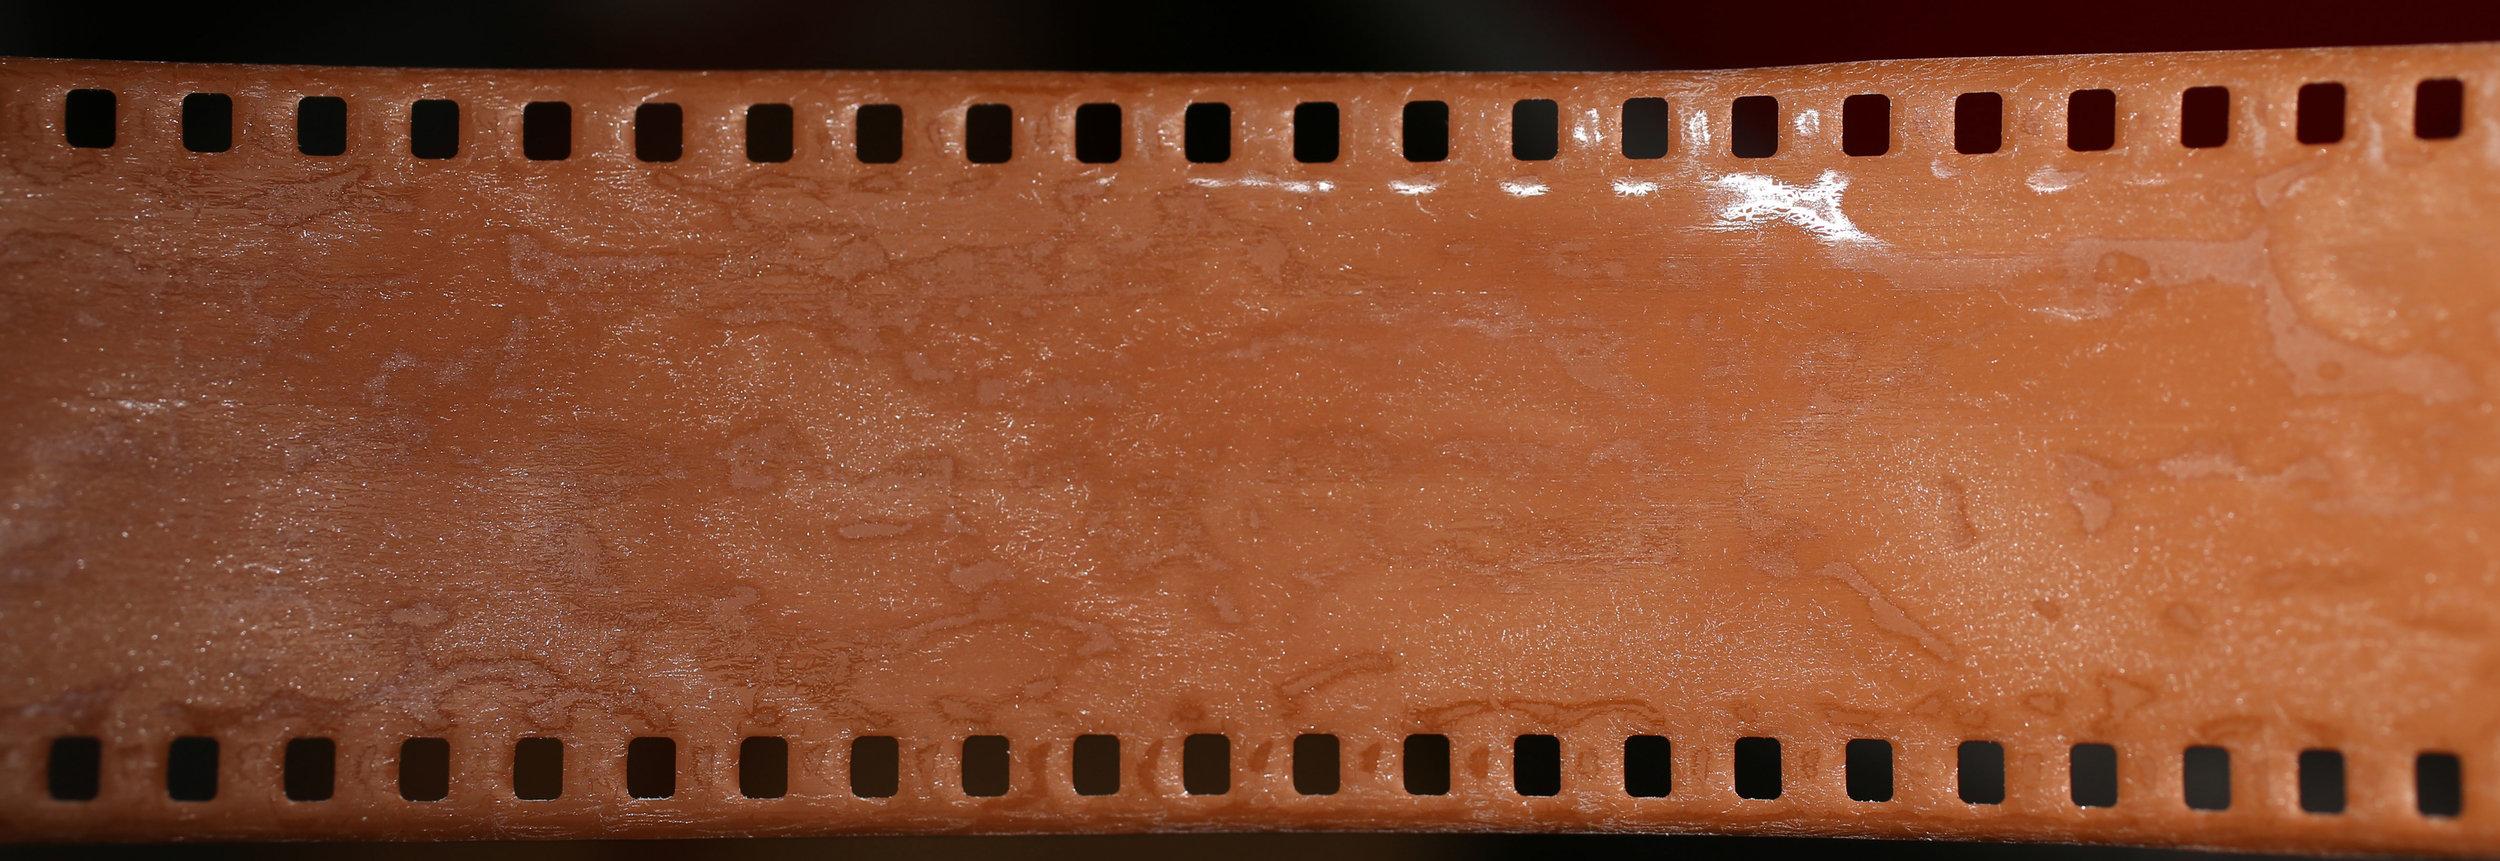 Dirty-film-example-1.jpg